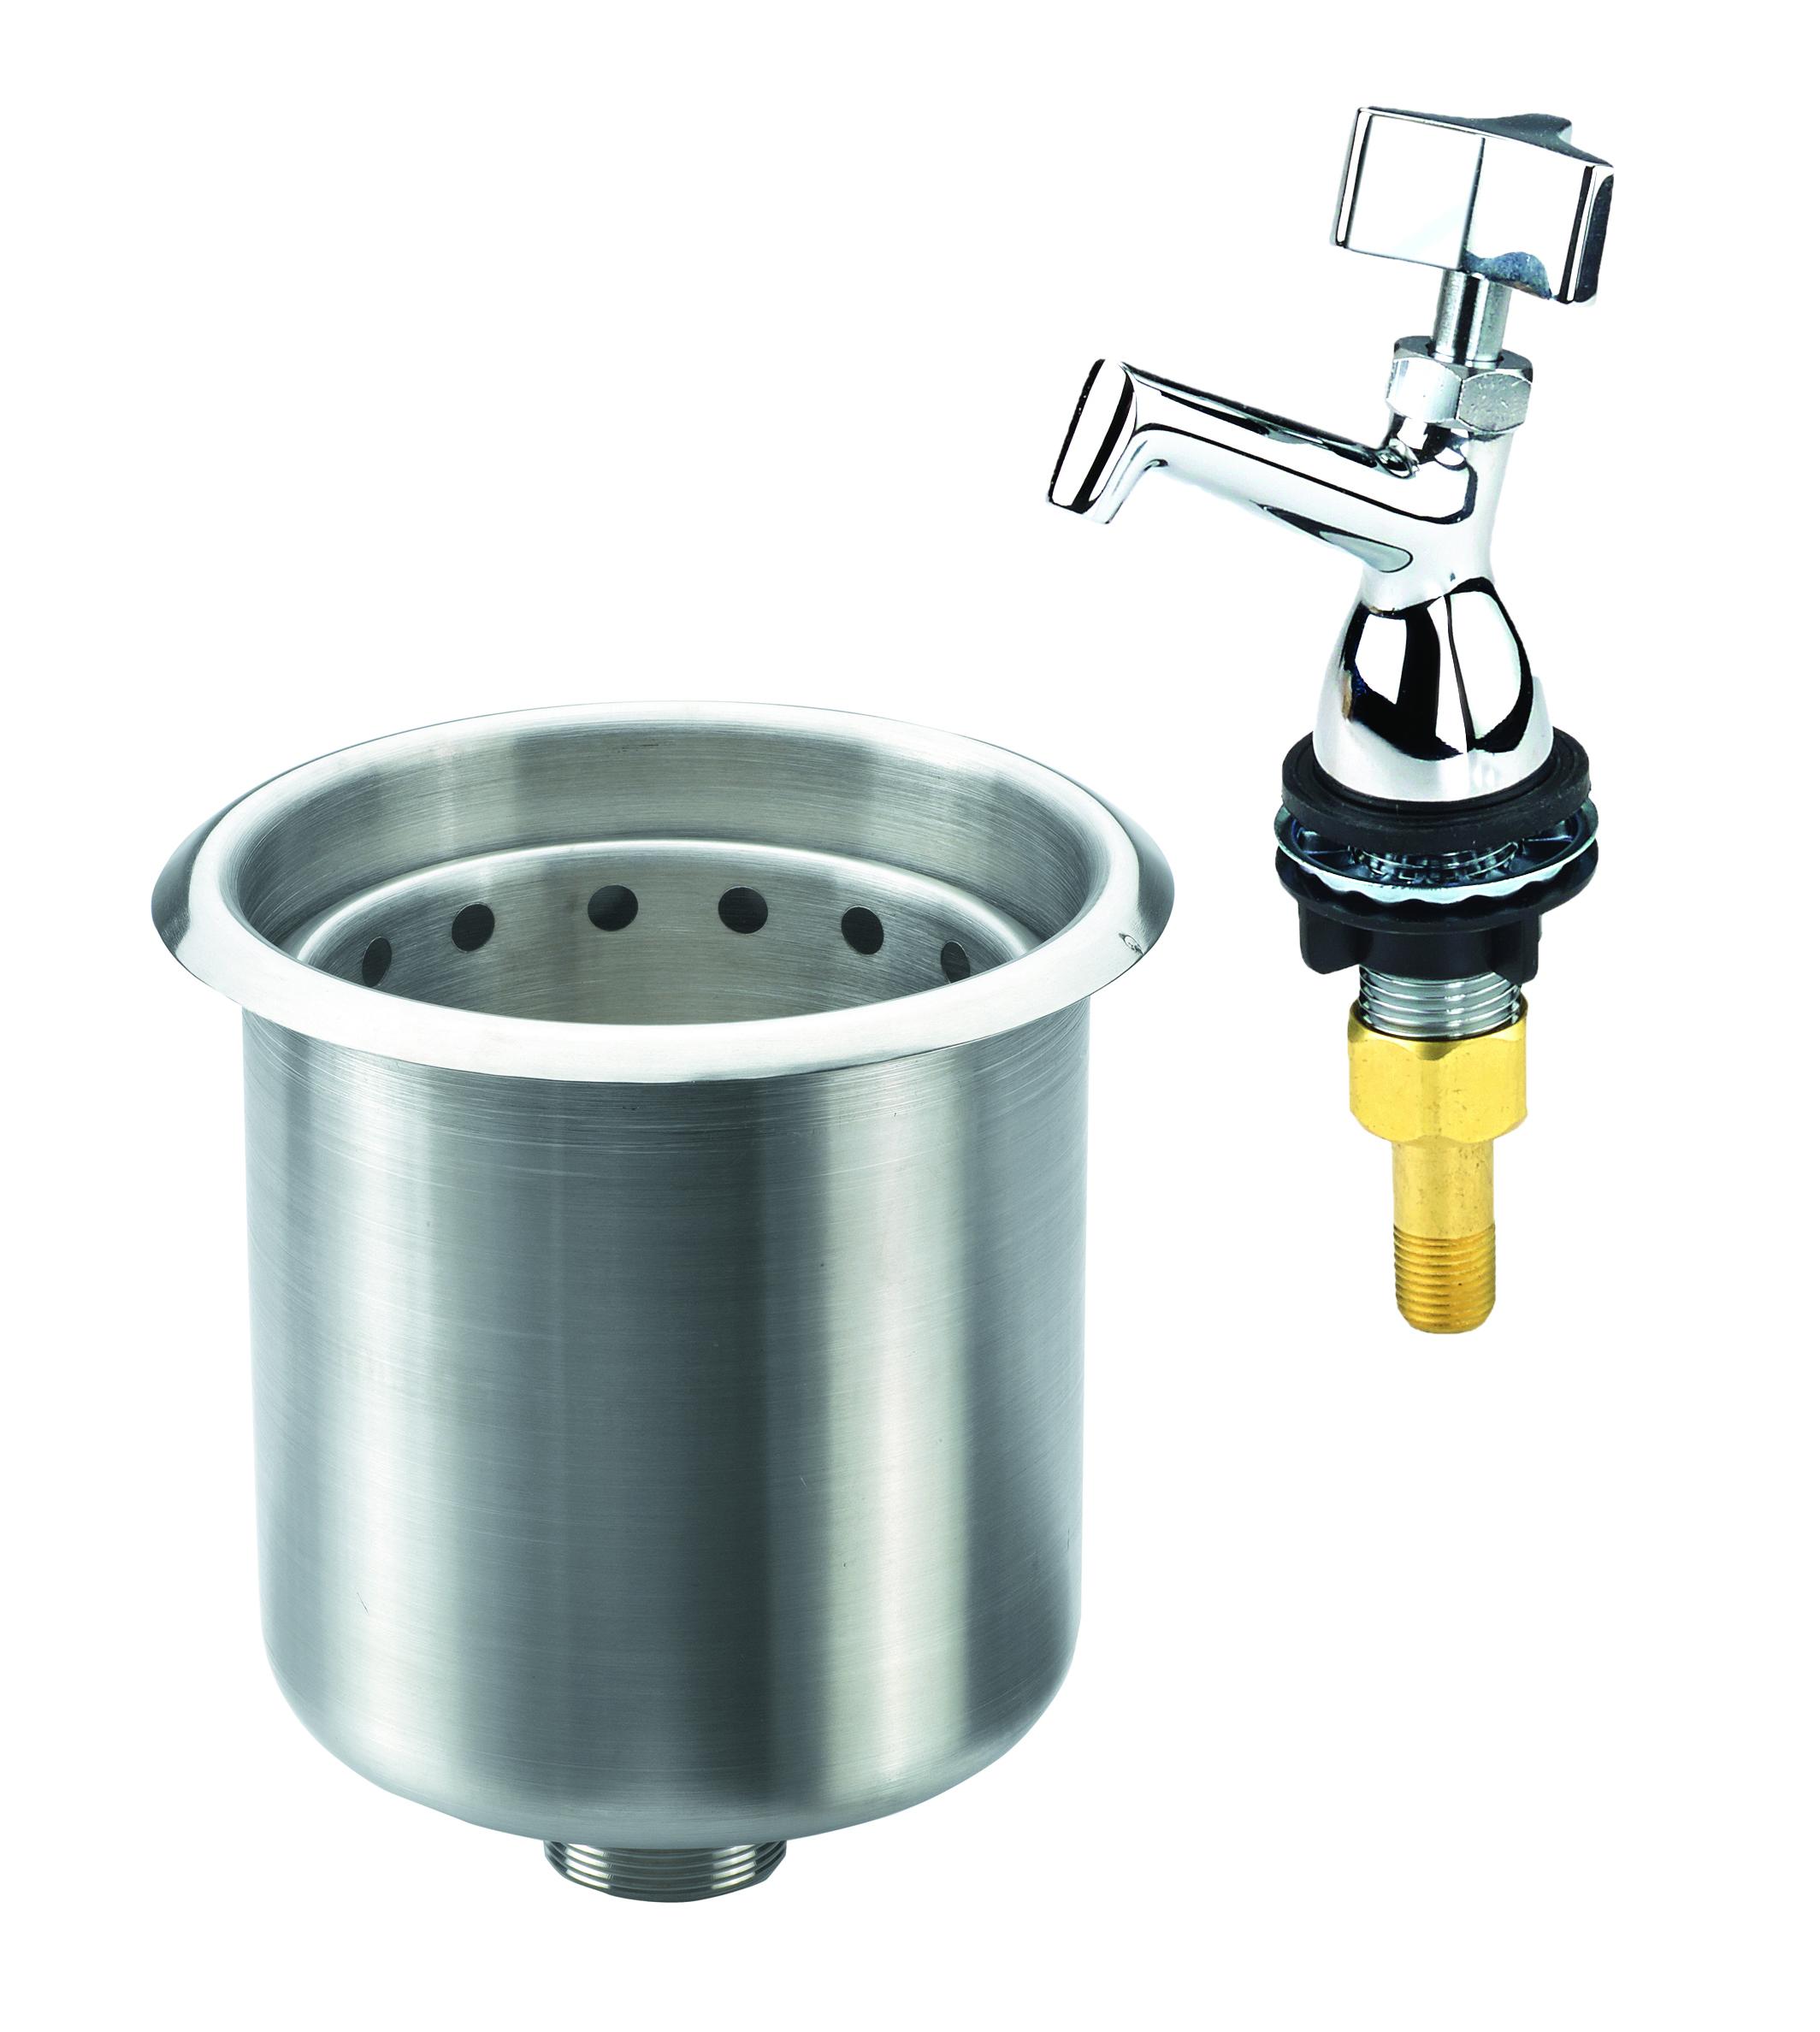 Krowne Metal 16-149 plumbing